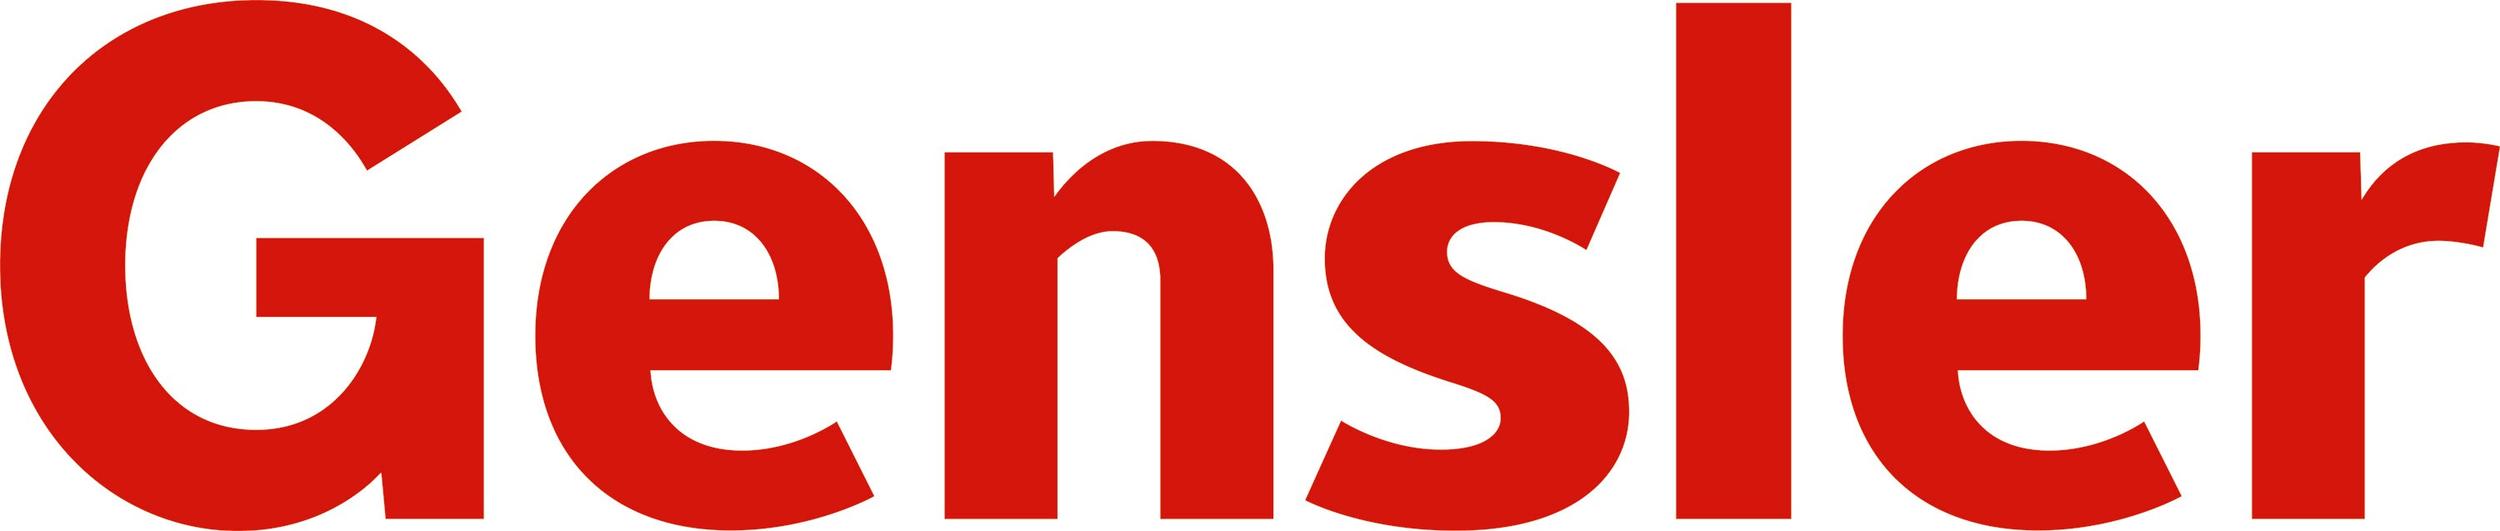 Gensler-logo.png